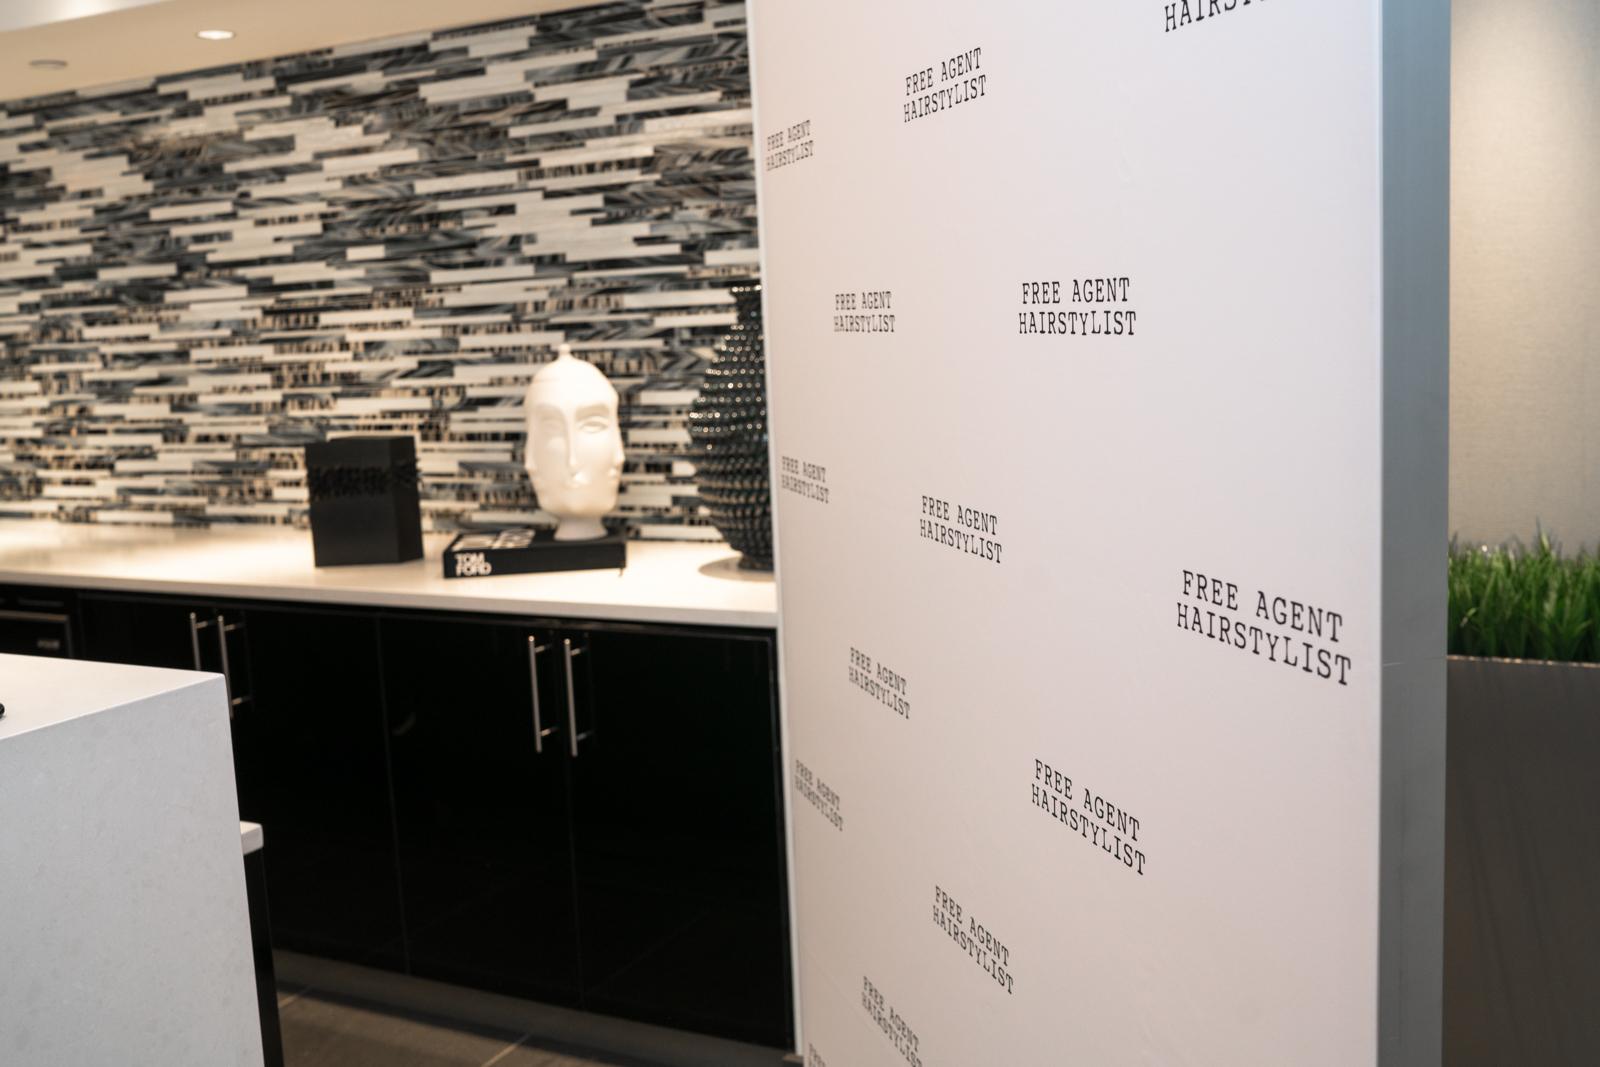 Selfie SEG fabric printing tension self-standing frames framing backdrop wall